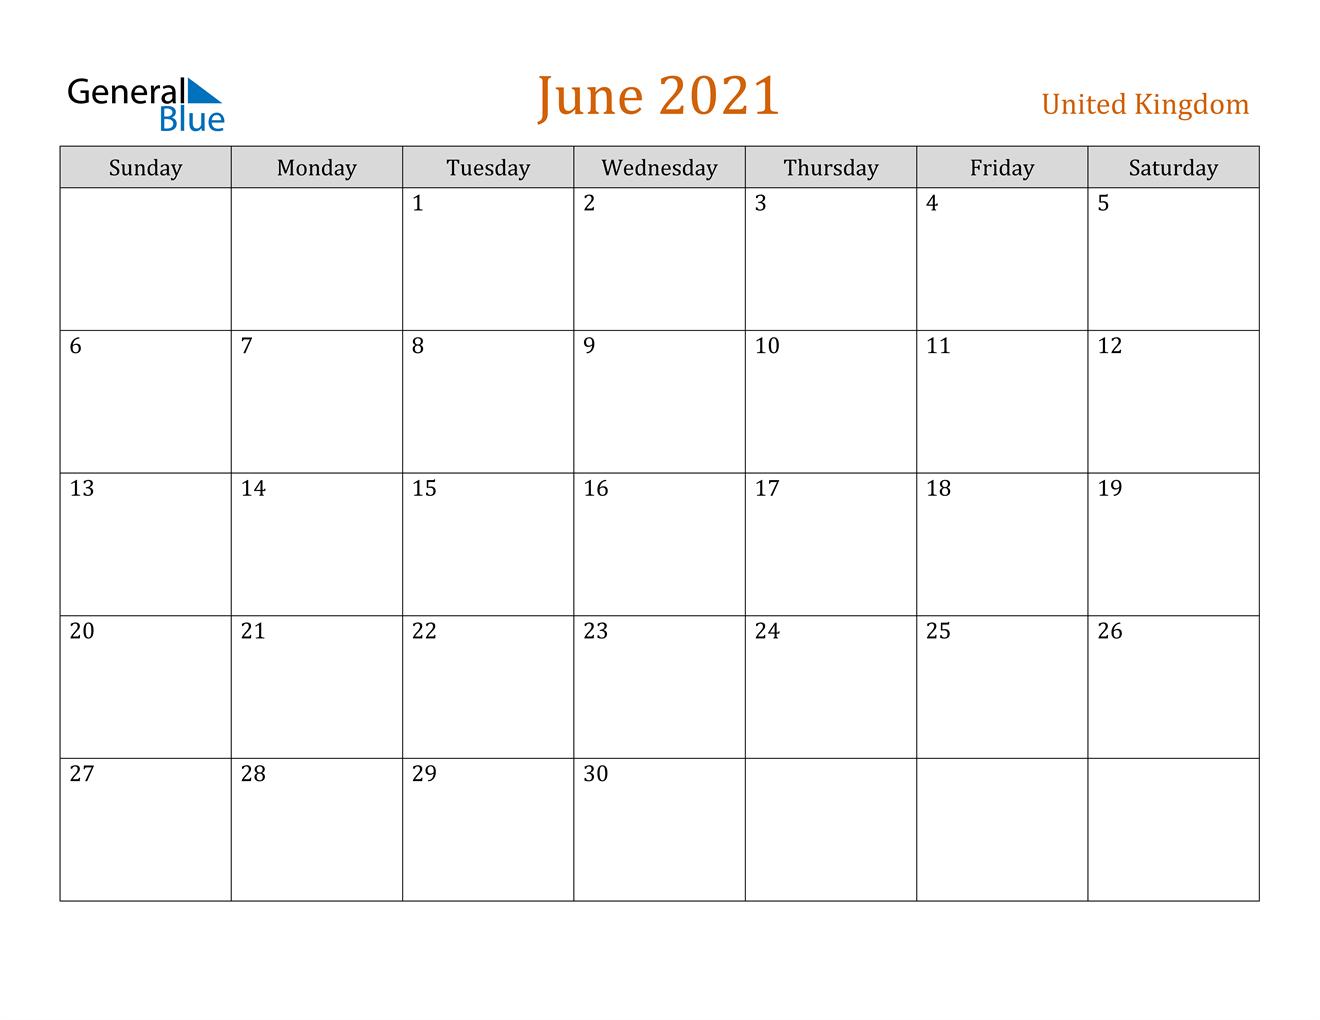 June 2021 Calendar - United Kingdom